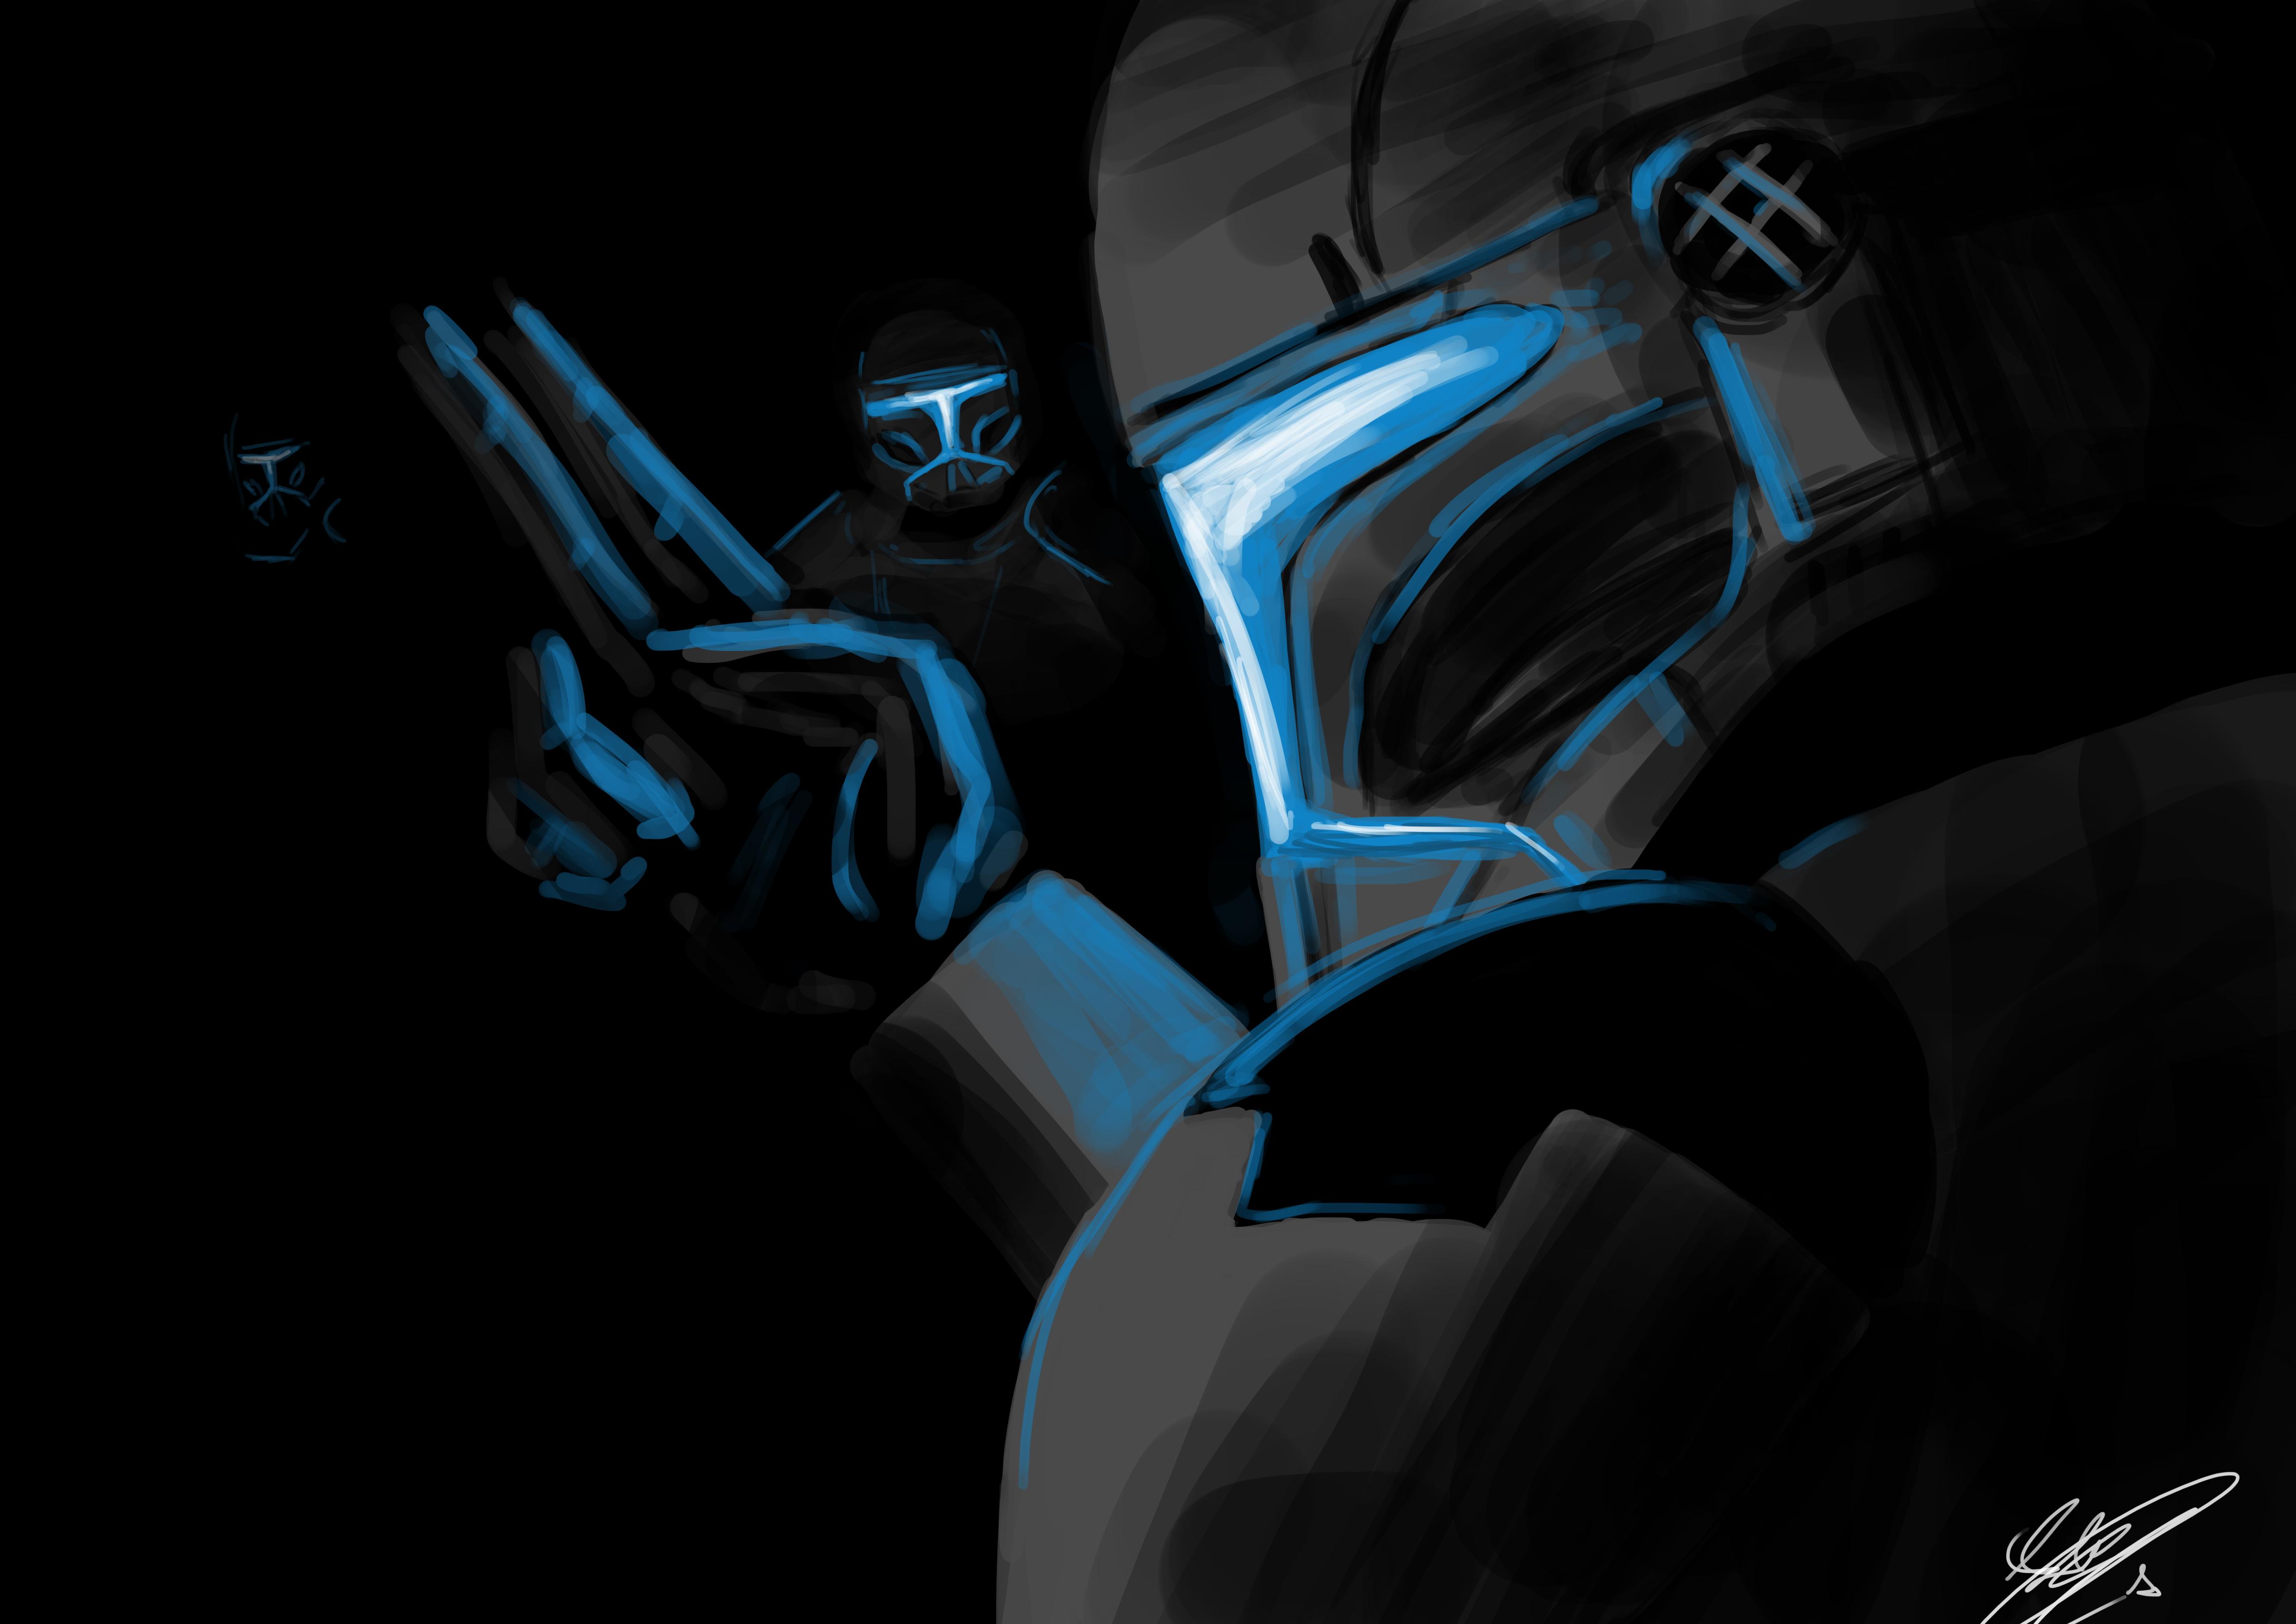 Clone Trooper Star Wars 5k Hd Movies 4k Wallpapers Images